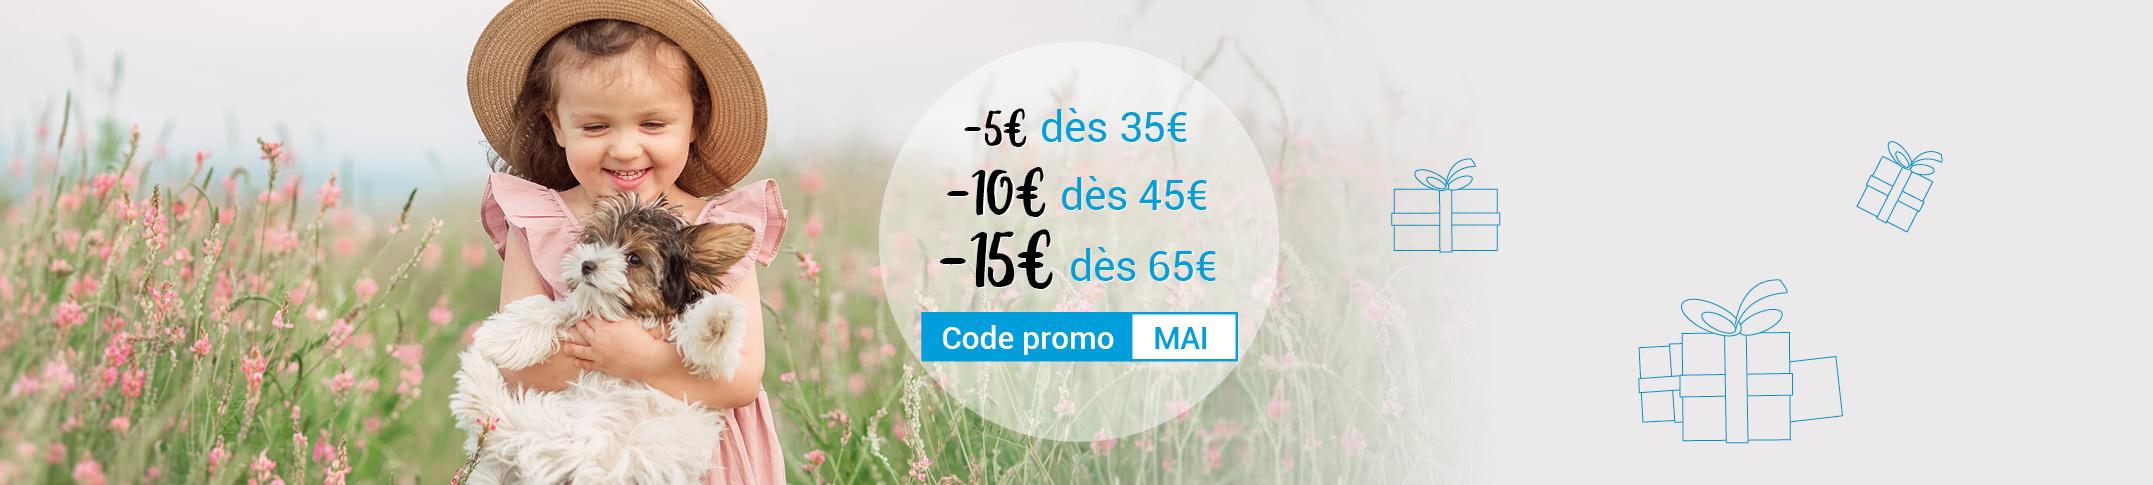 Promo mai smartphoto.fr